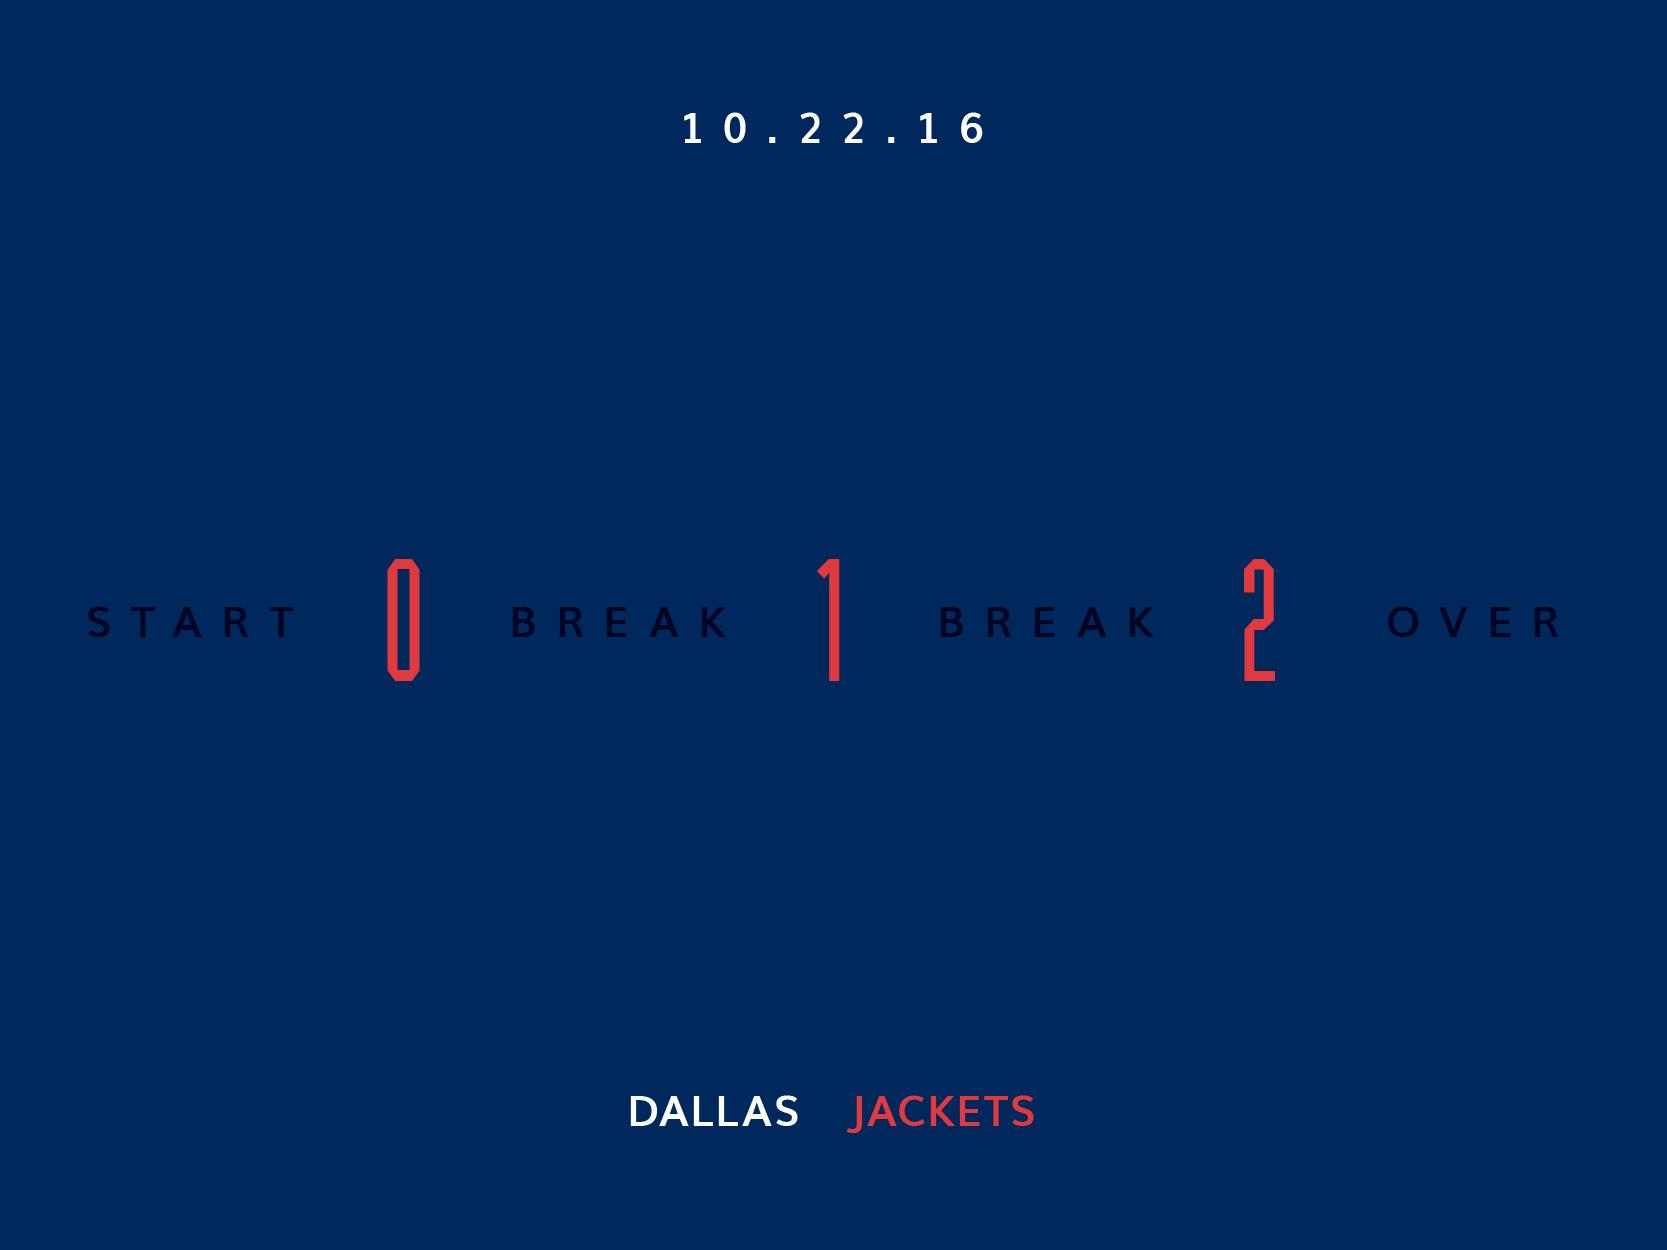 Blue Jackets Score October 22, 2016